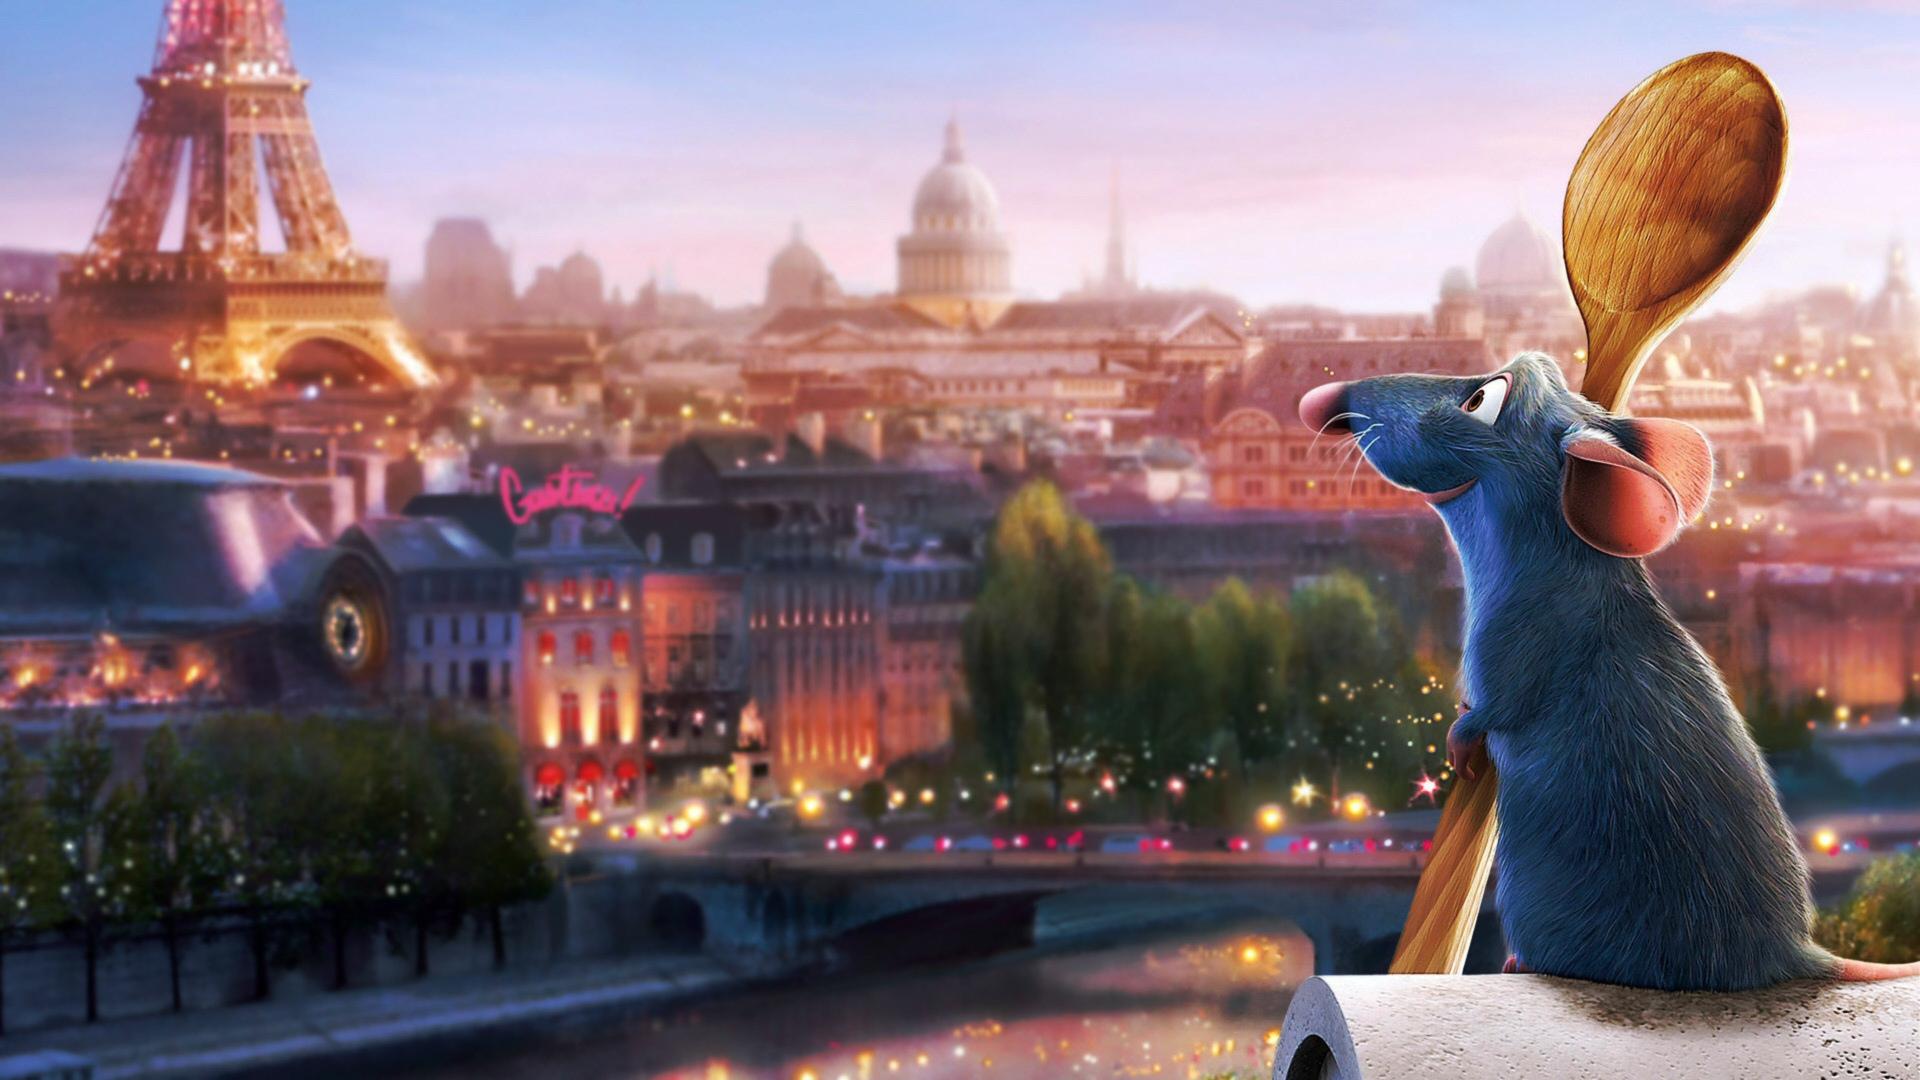 Ratatouille a la Remy (Confit Byaldi by Thomas Keller)